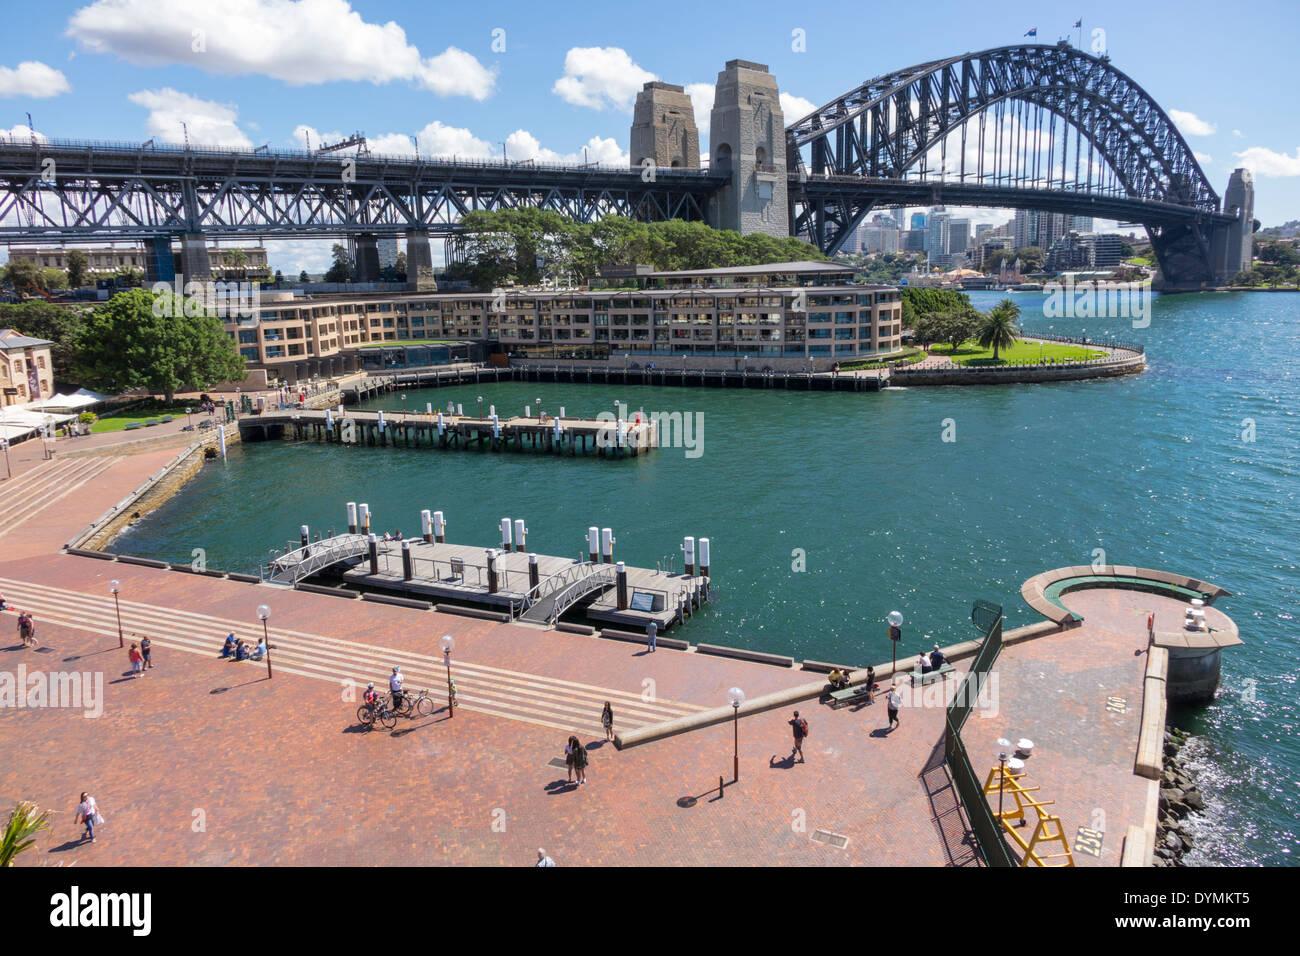 Sydney Australia NSW New South Wales West Circular Quay Sydney Harbour Bridge harbor Parramatta River water Park Hyatt hotel Hickson Road Reserve - Stock Image